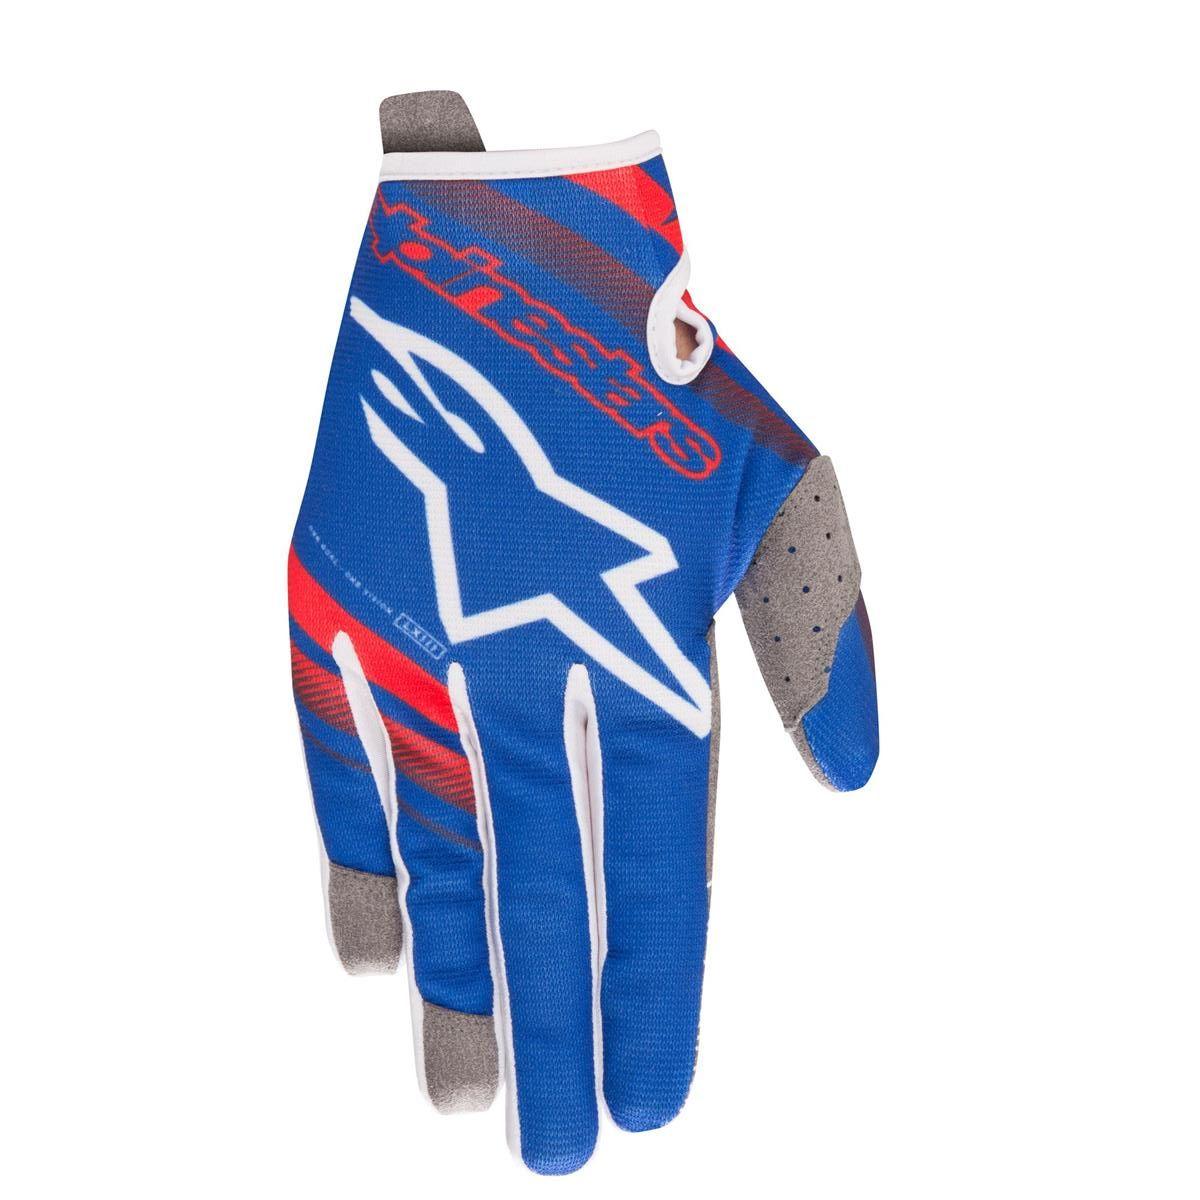 Alpinestars Handschuhe Radar Blau/Rot/Weiß